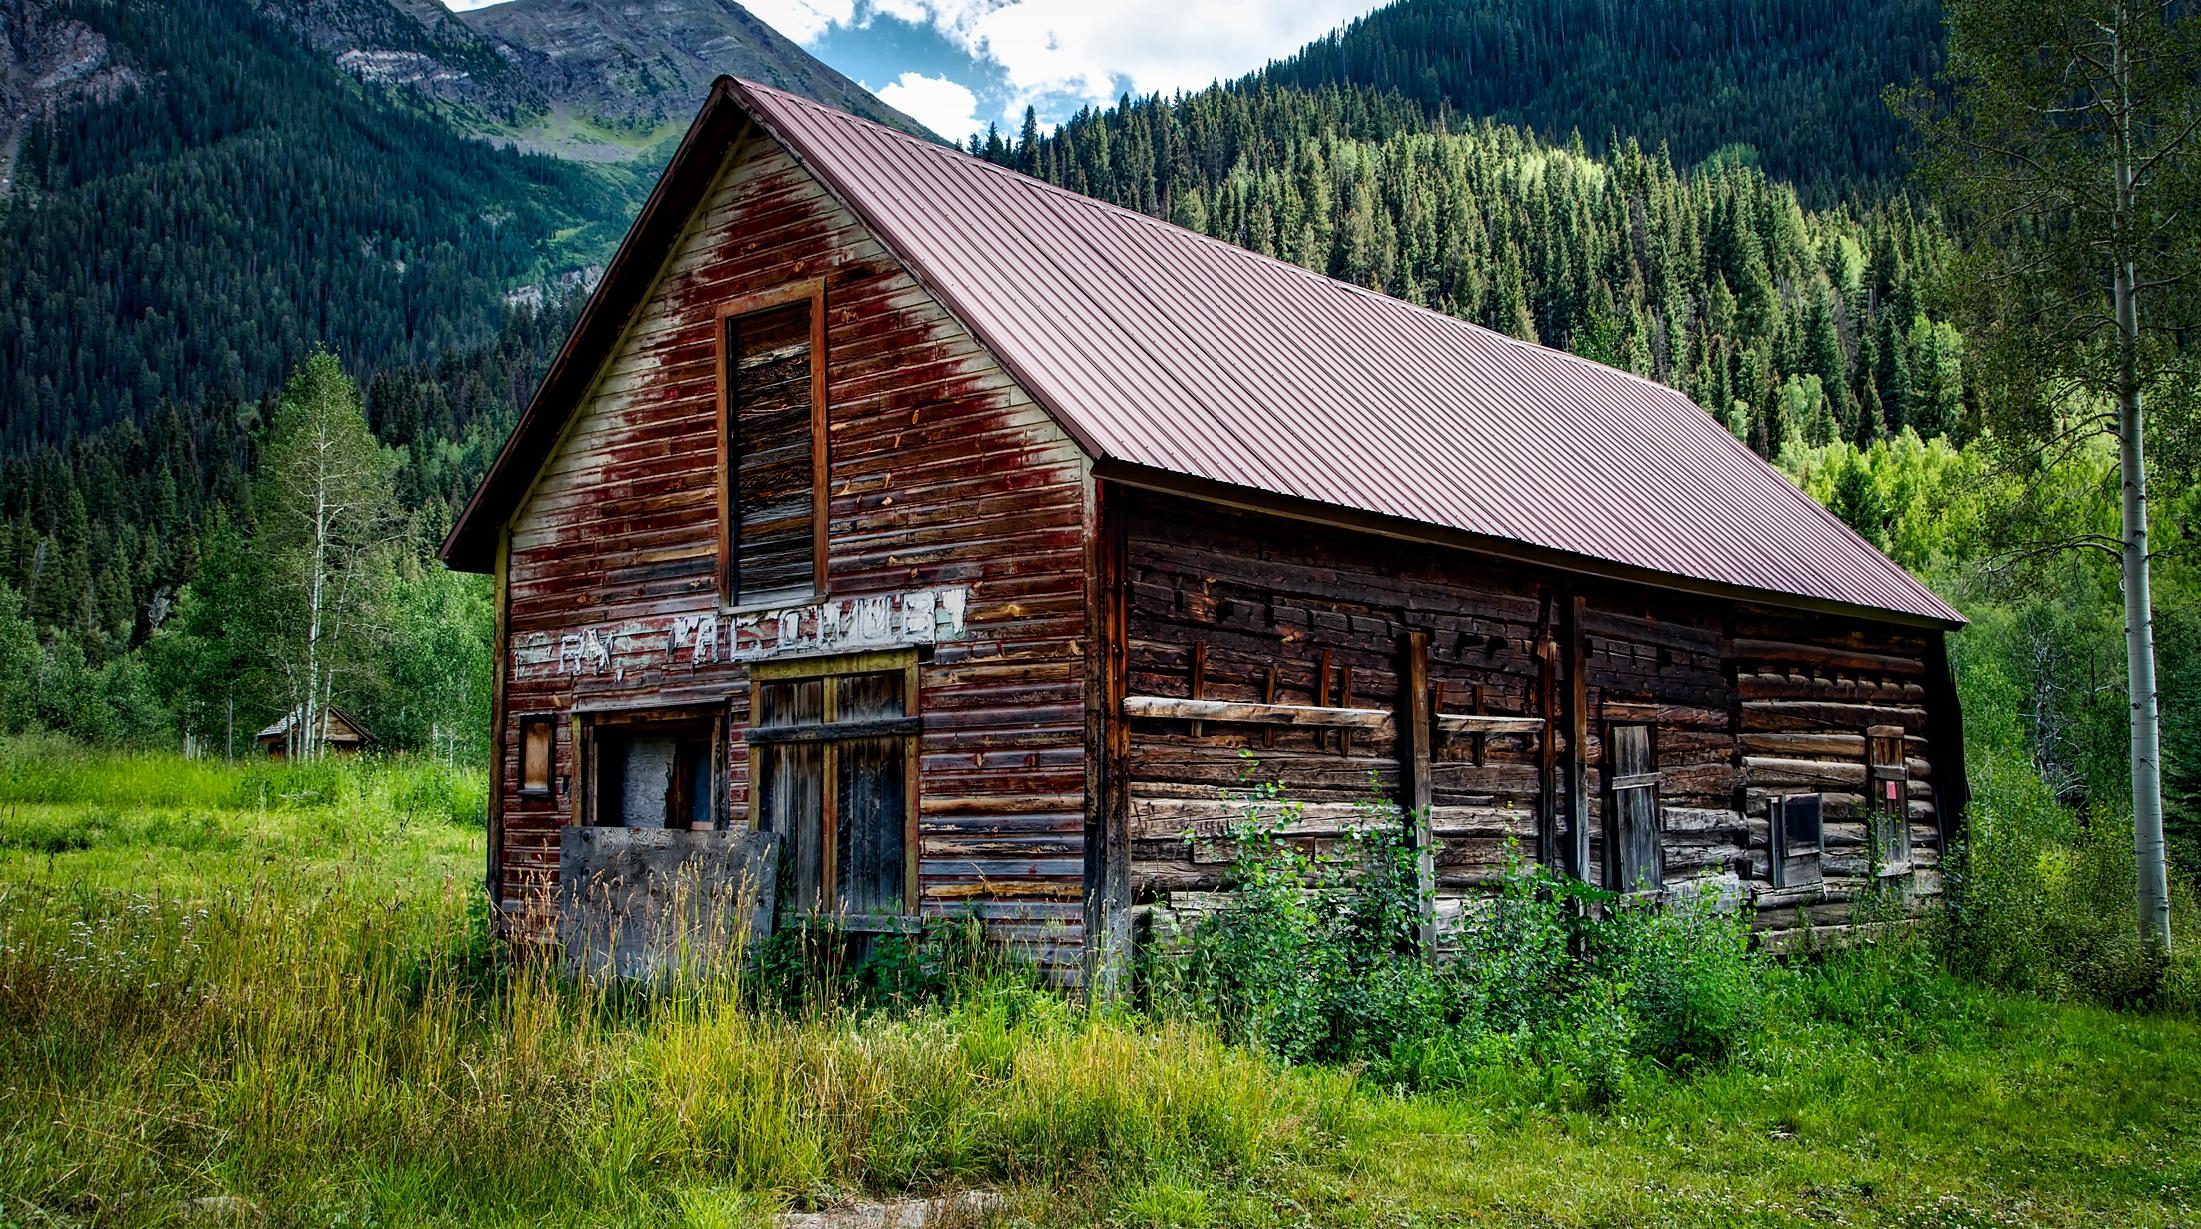 Free Images Landscape Nature Forest Wilderness Farm